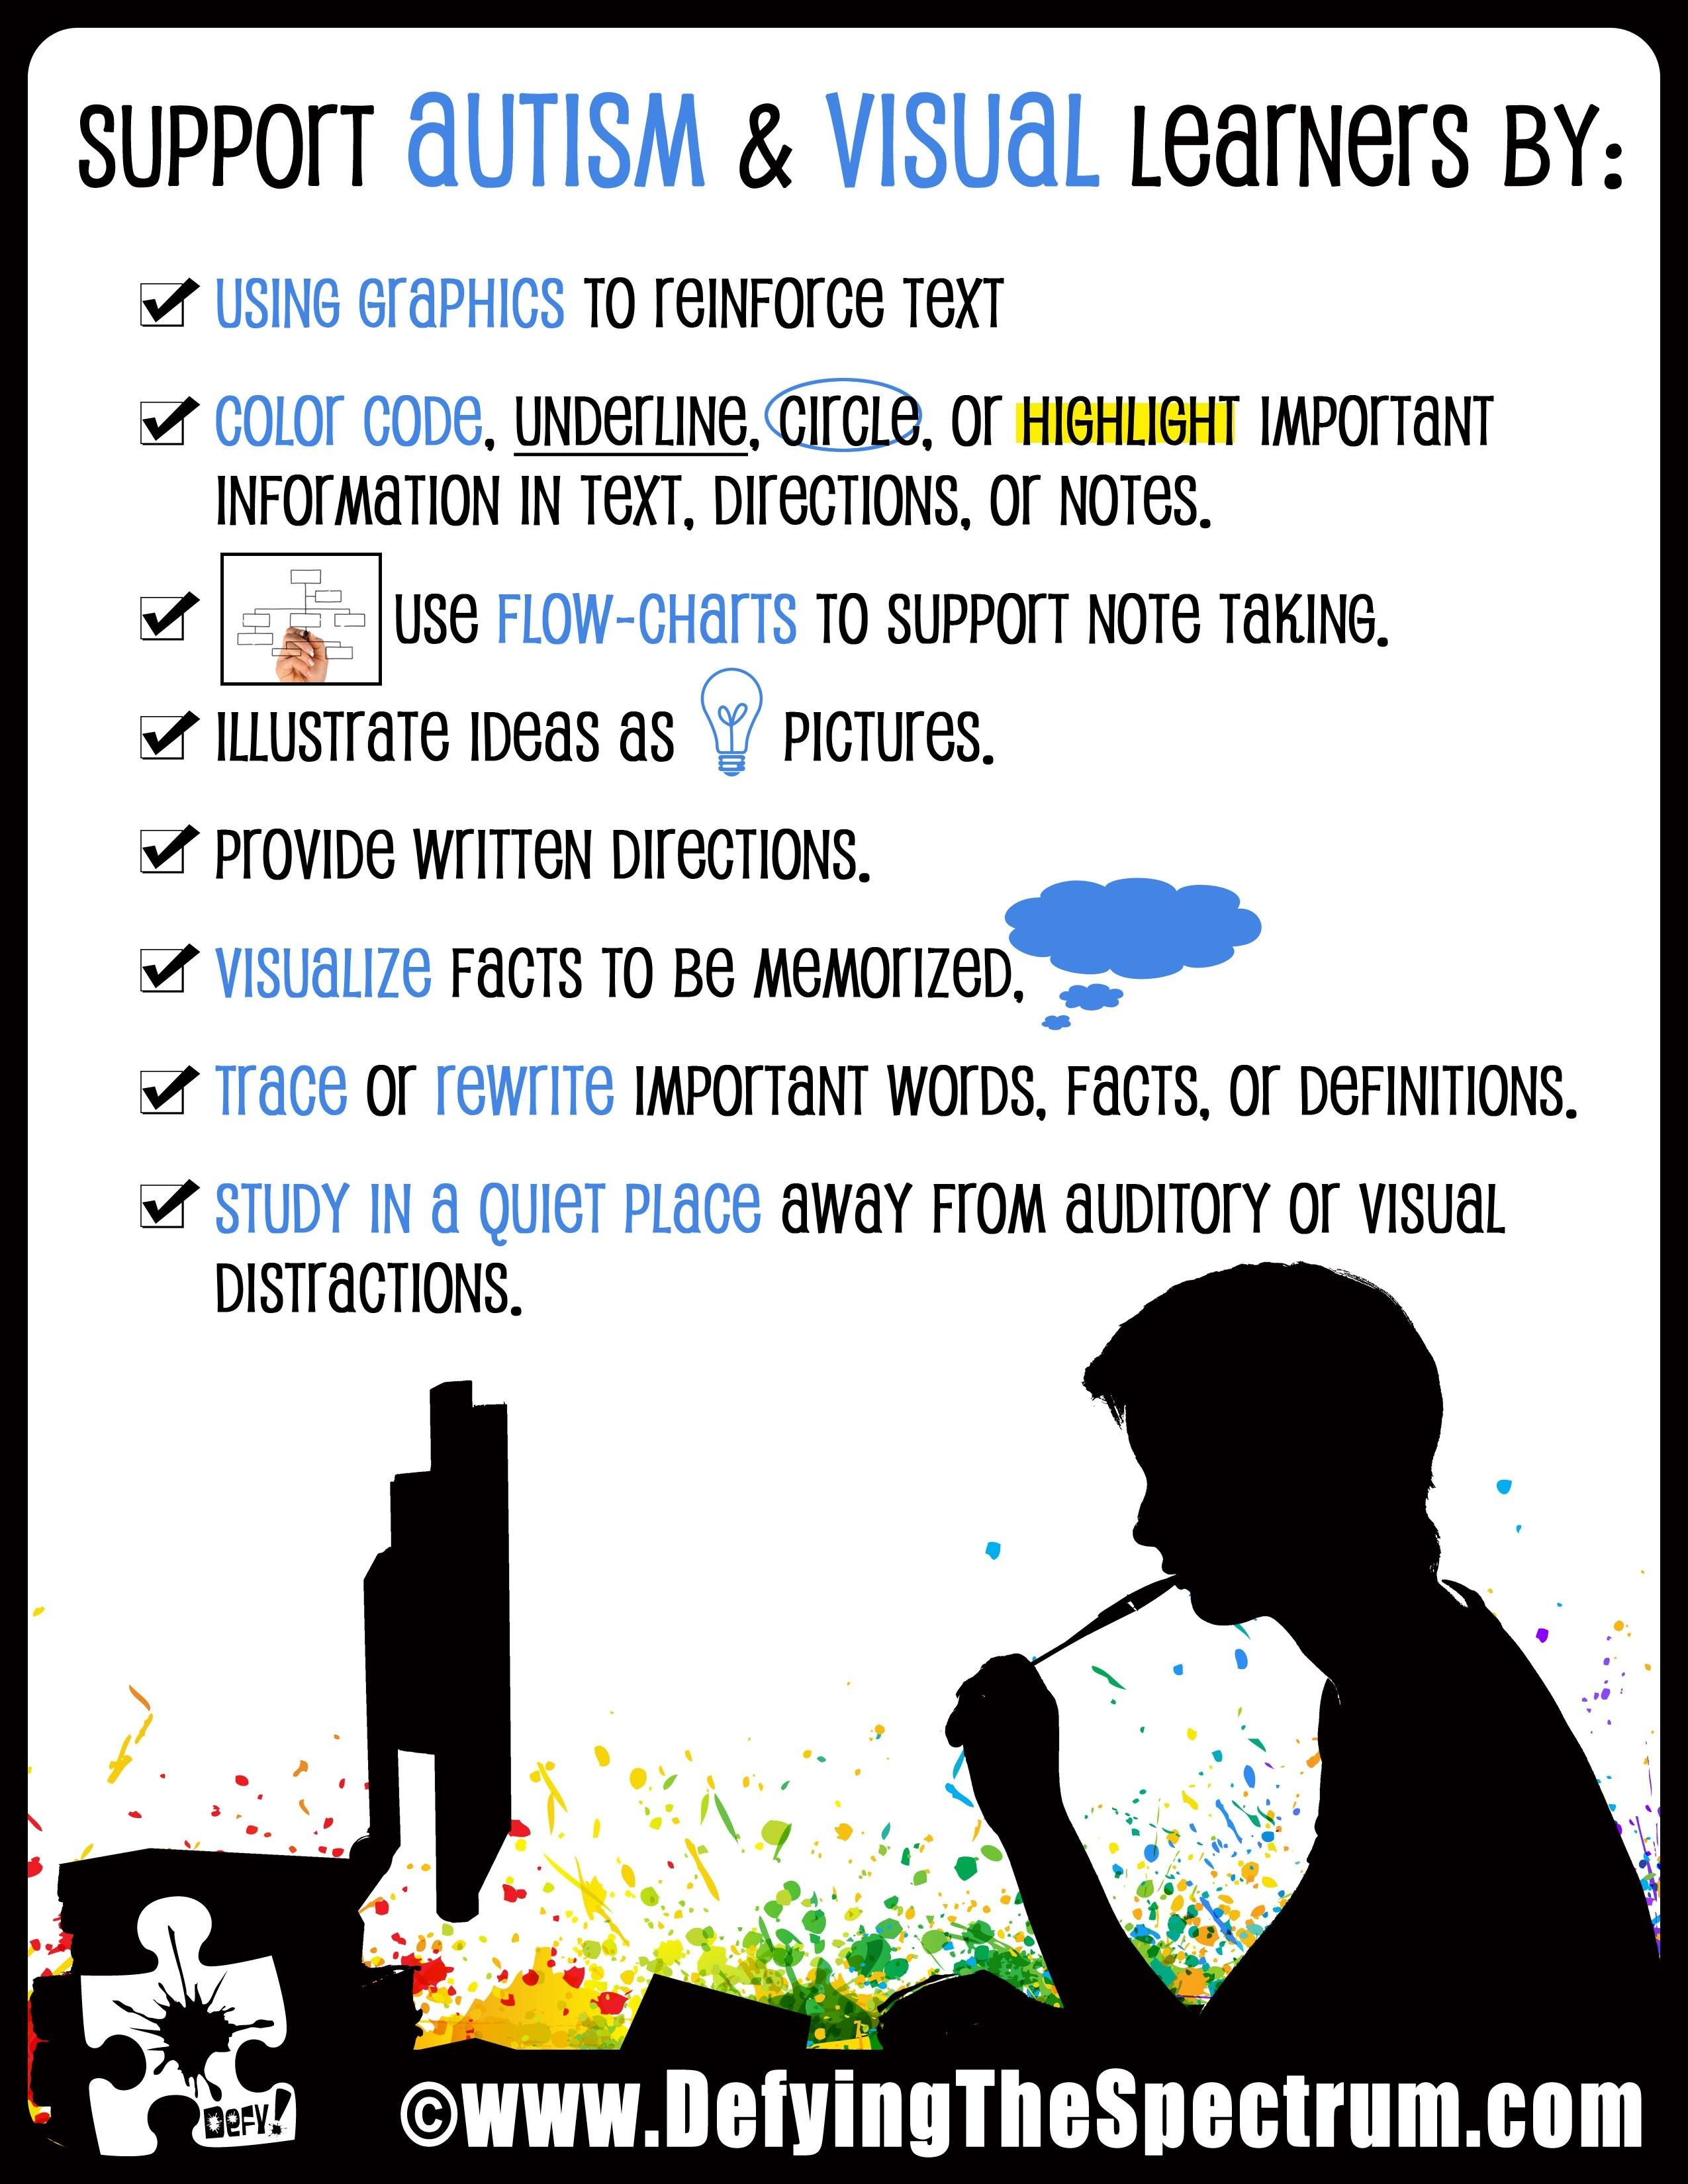 Free Autism Awareness Printables - Free Printable Autism Awareness Posters